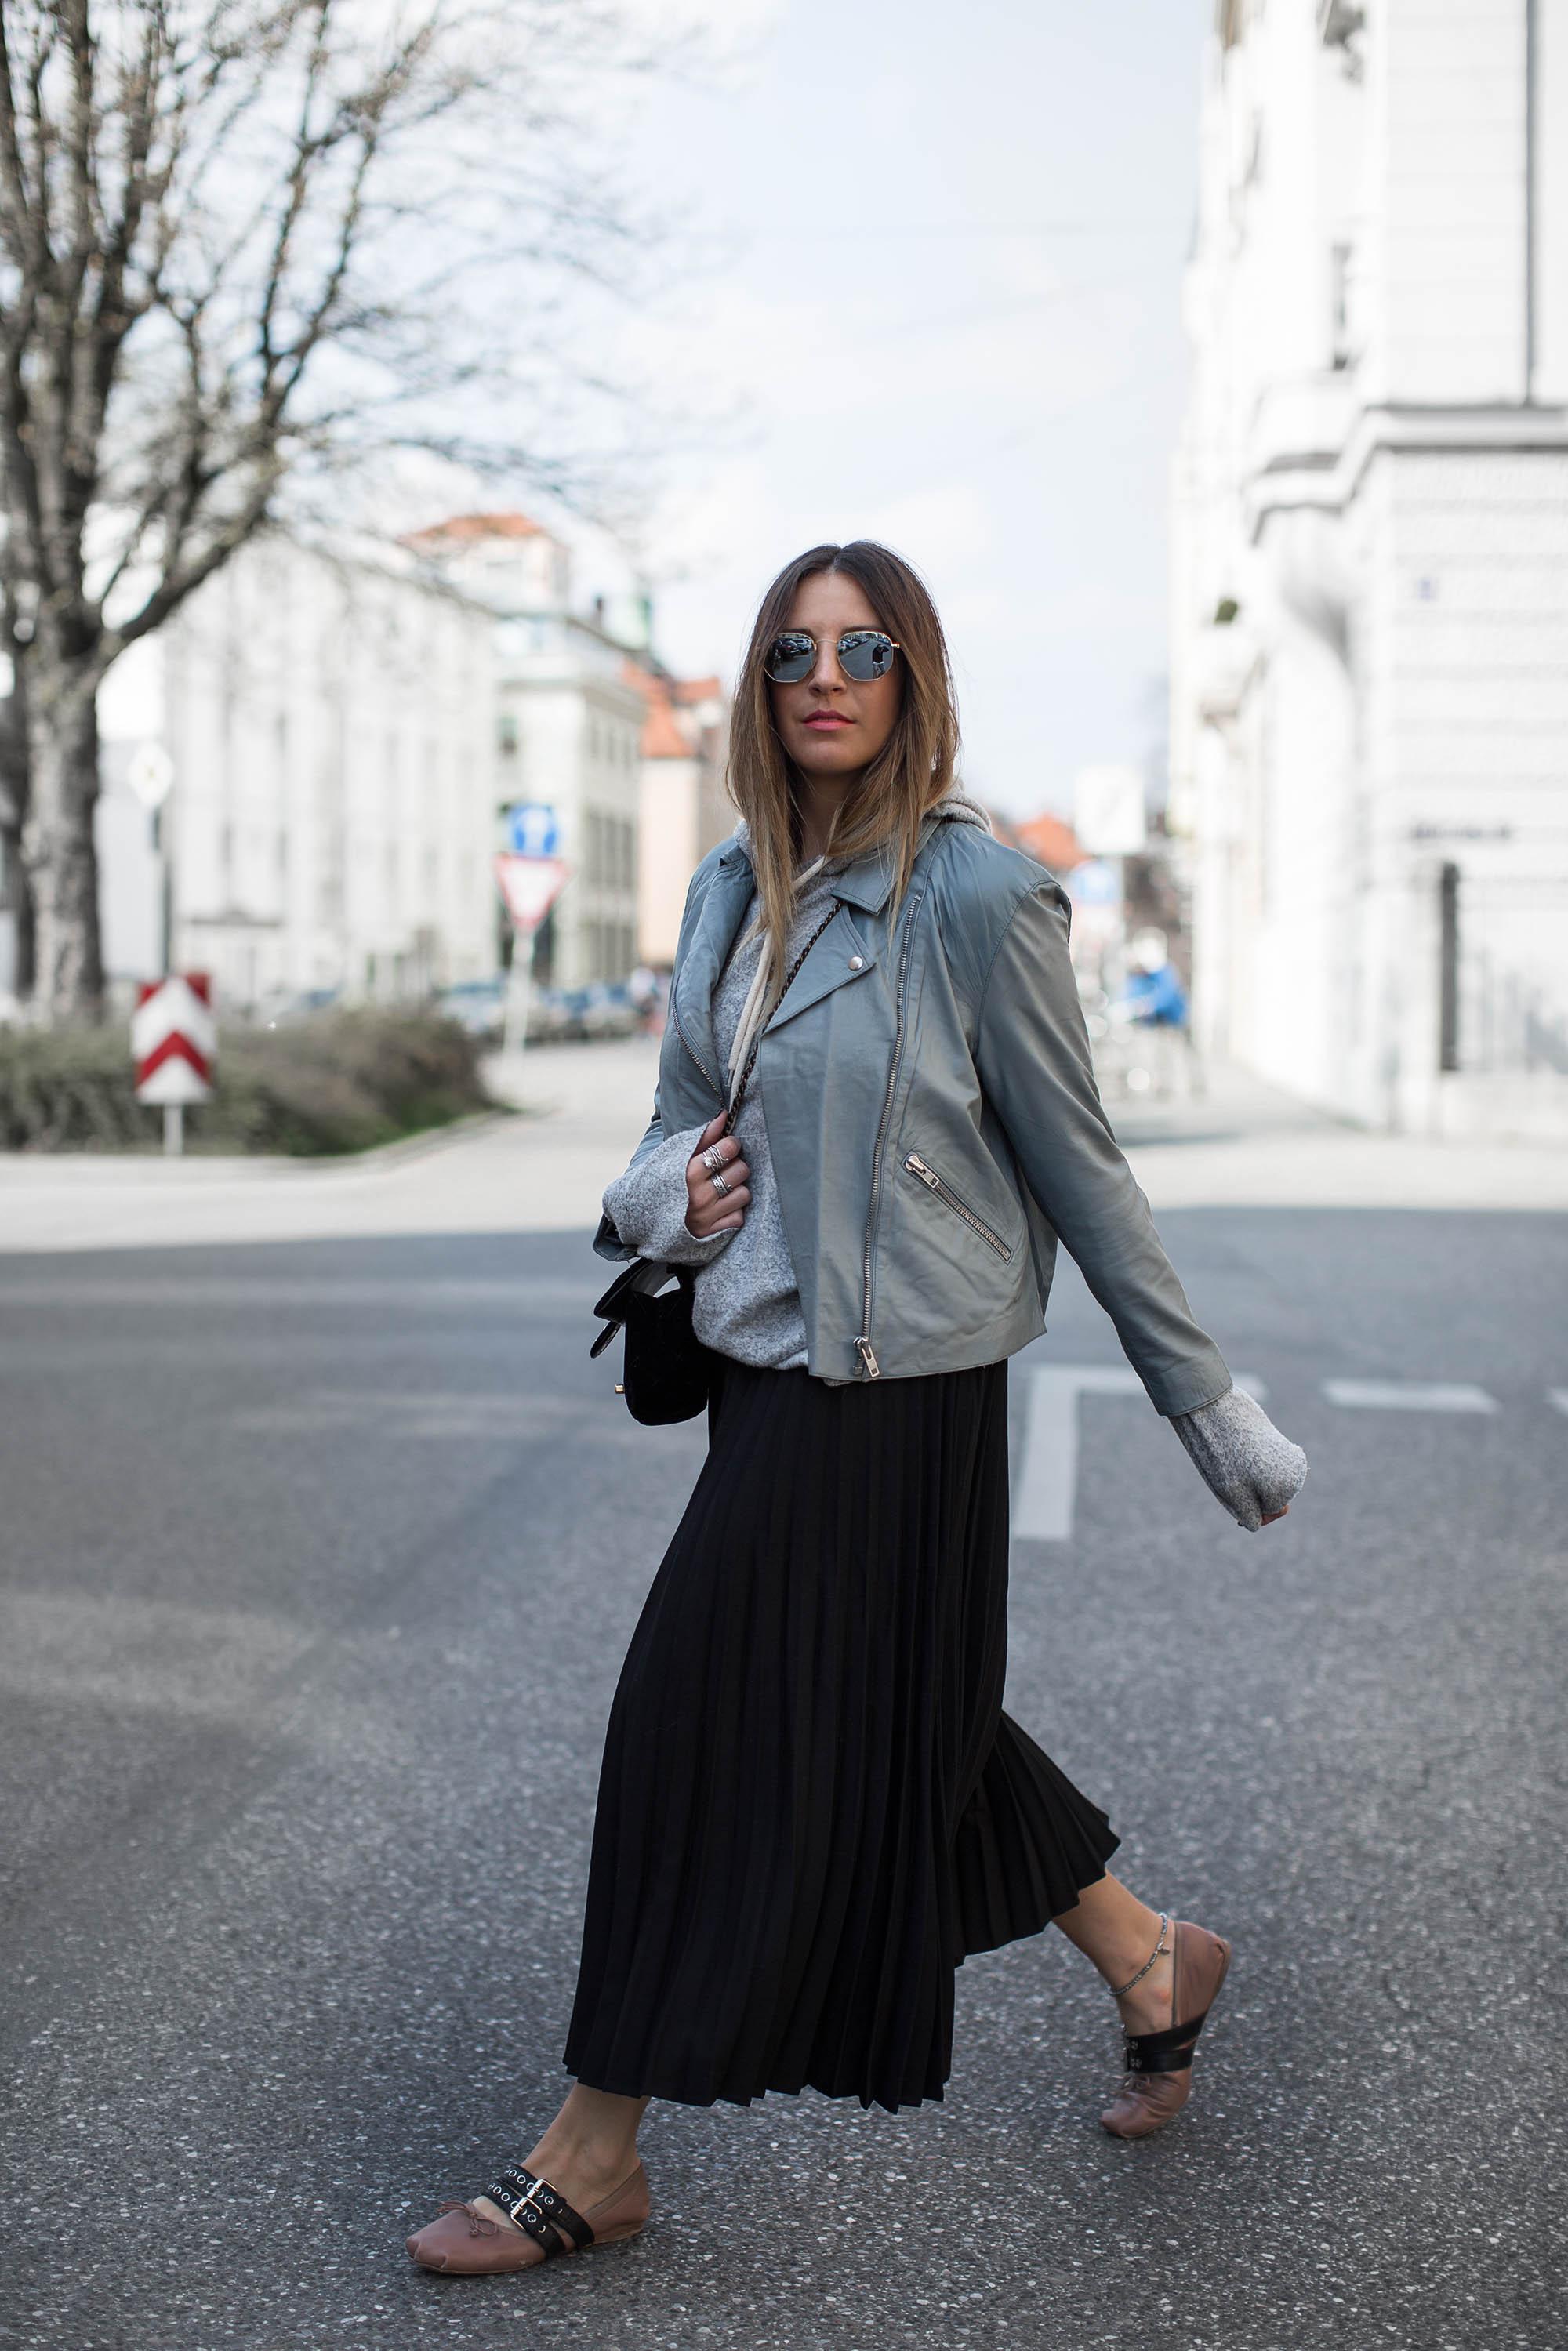 black-palms-asos-miumiu-chanel-leatherjacket-stilbruch-fashionblog-streetstyle-8-von-12